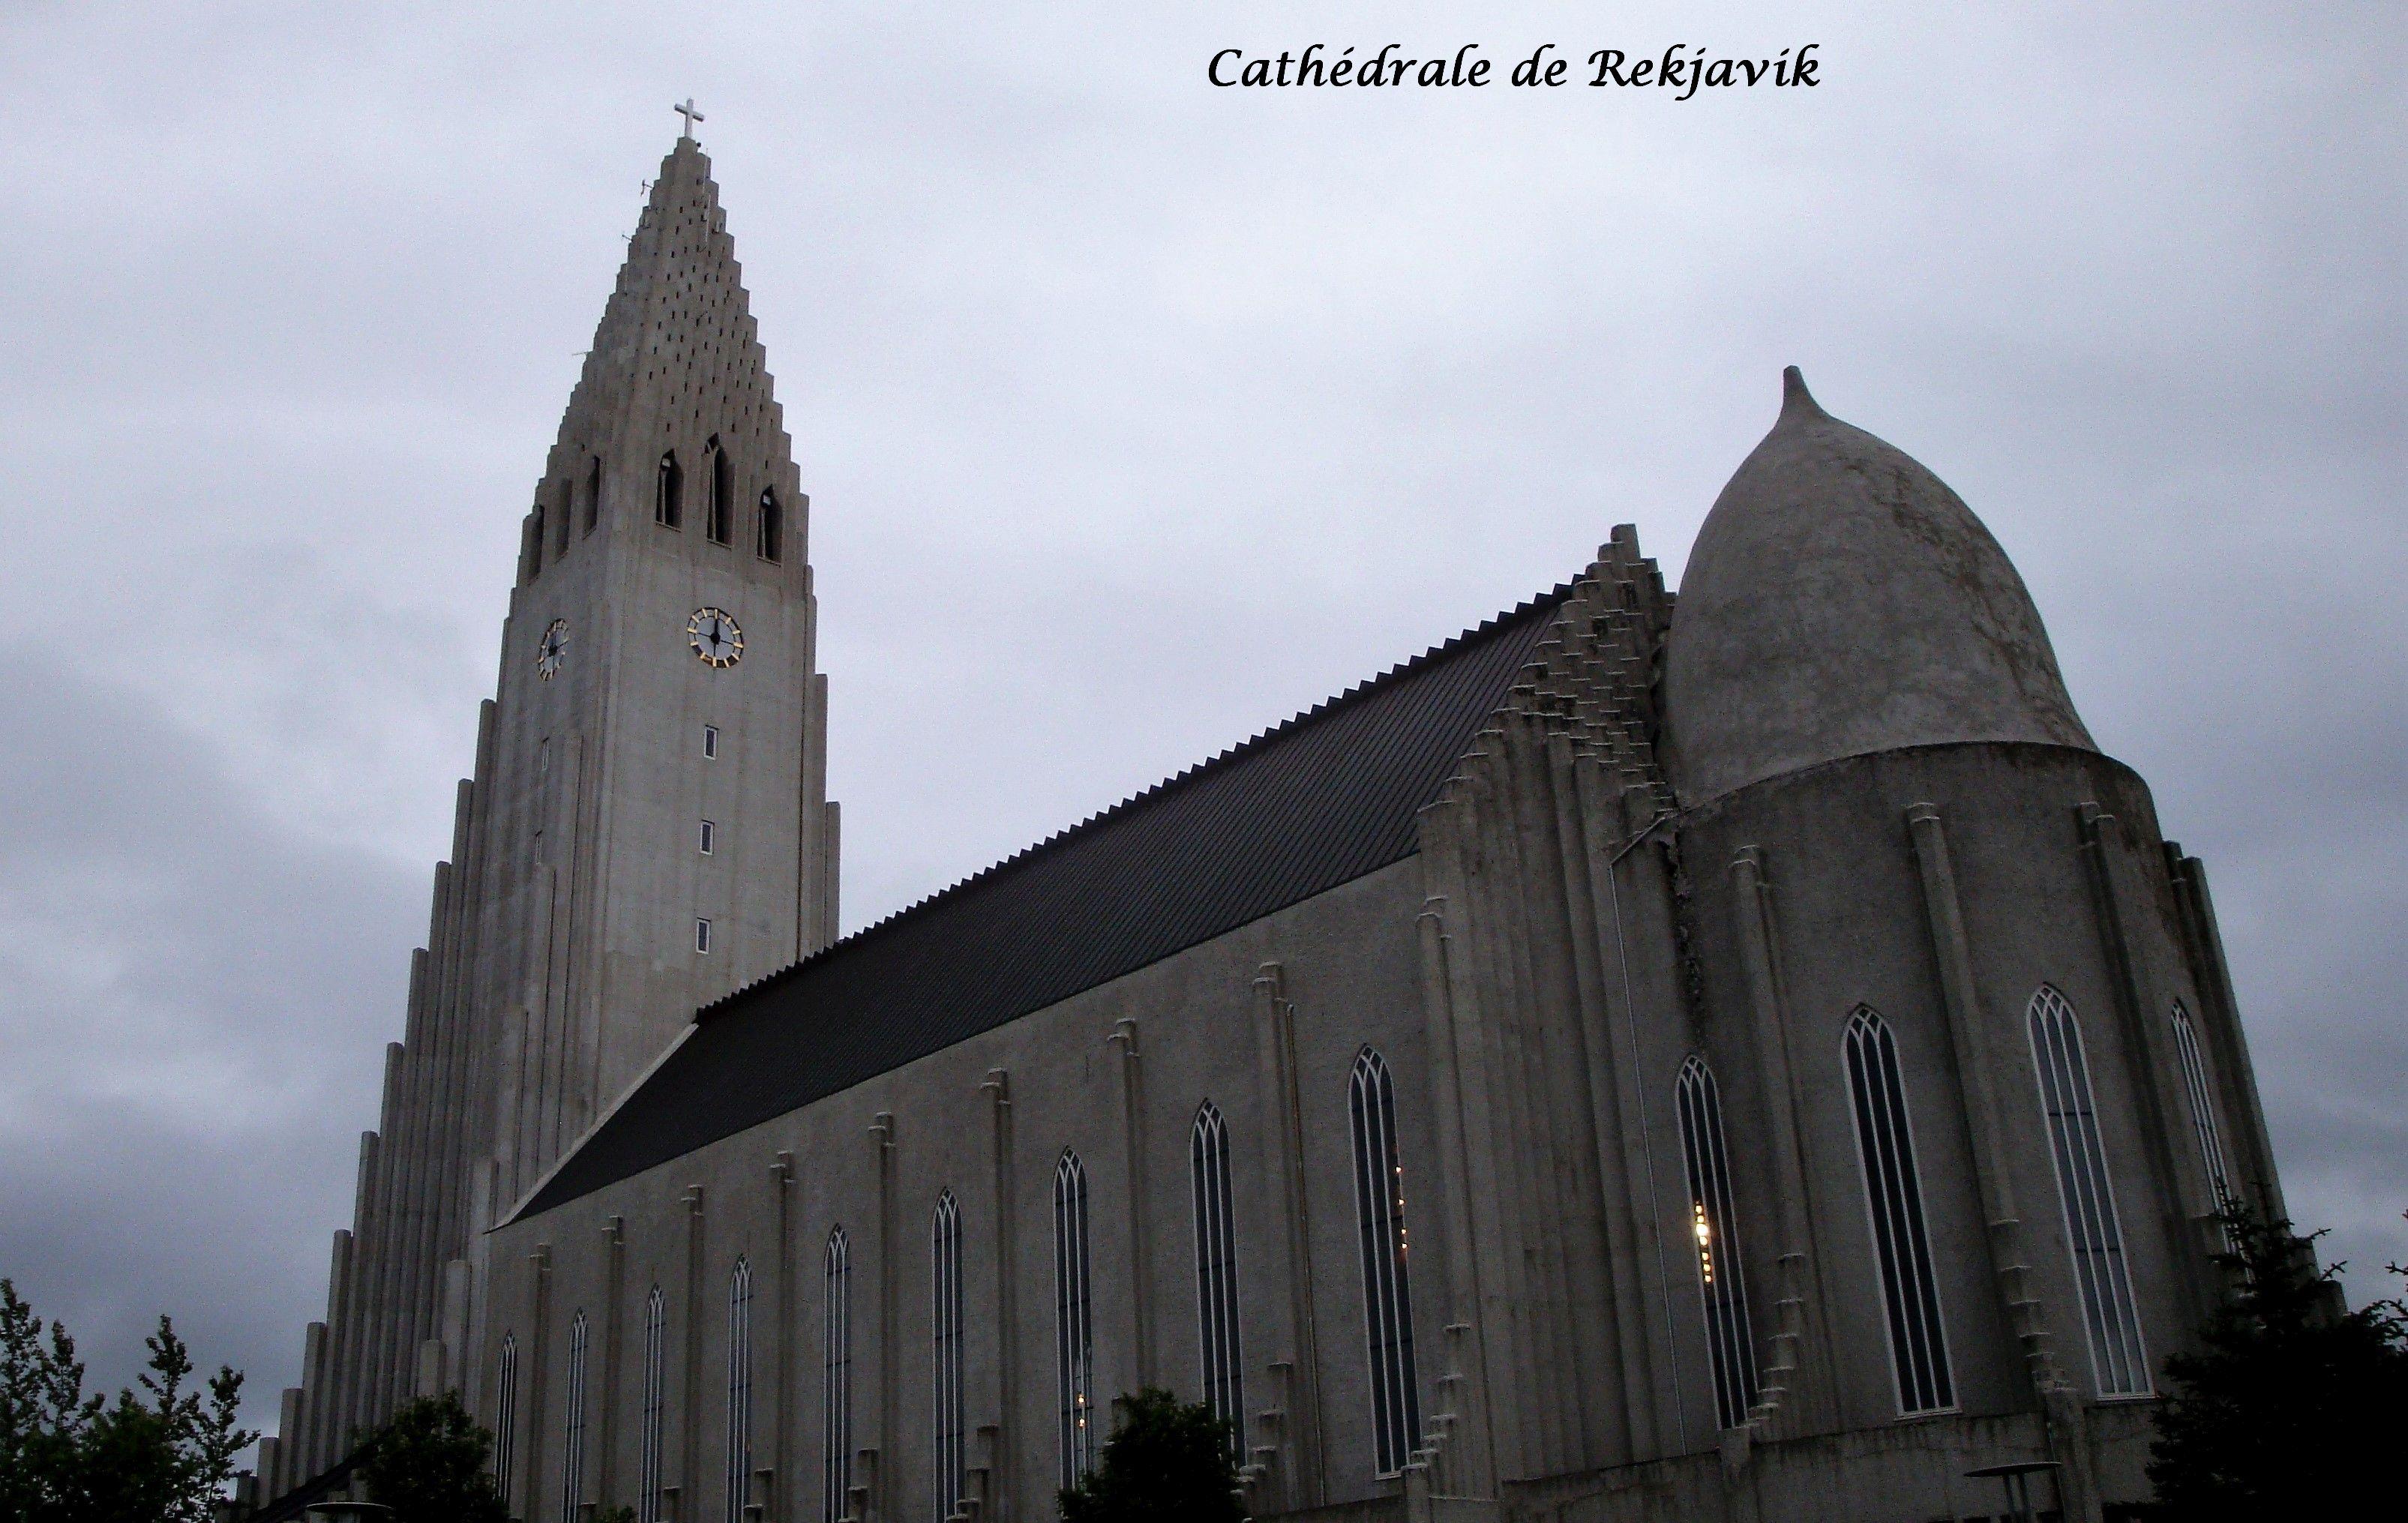 003 Reykjavik cathédrale Hallgrimskirkja